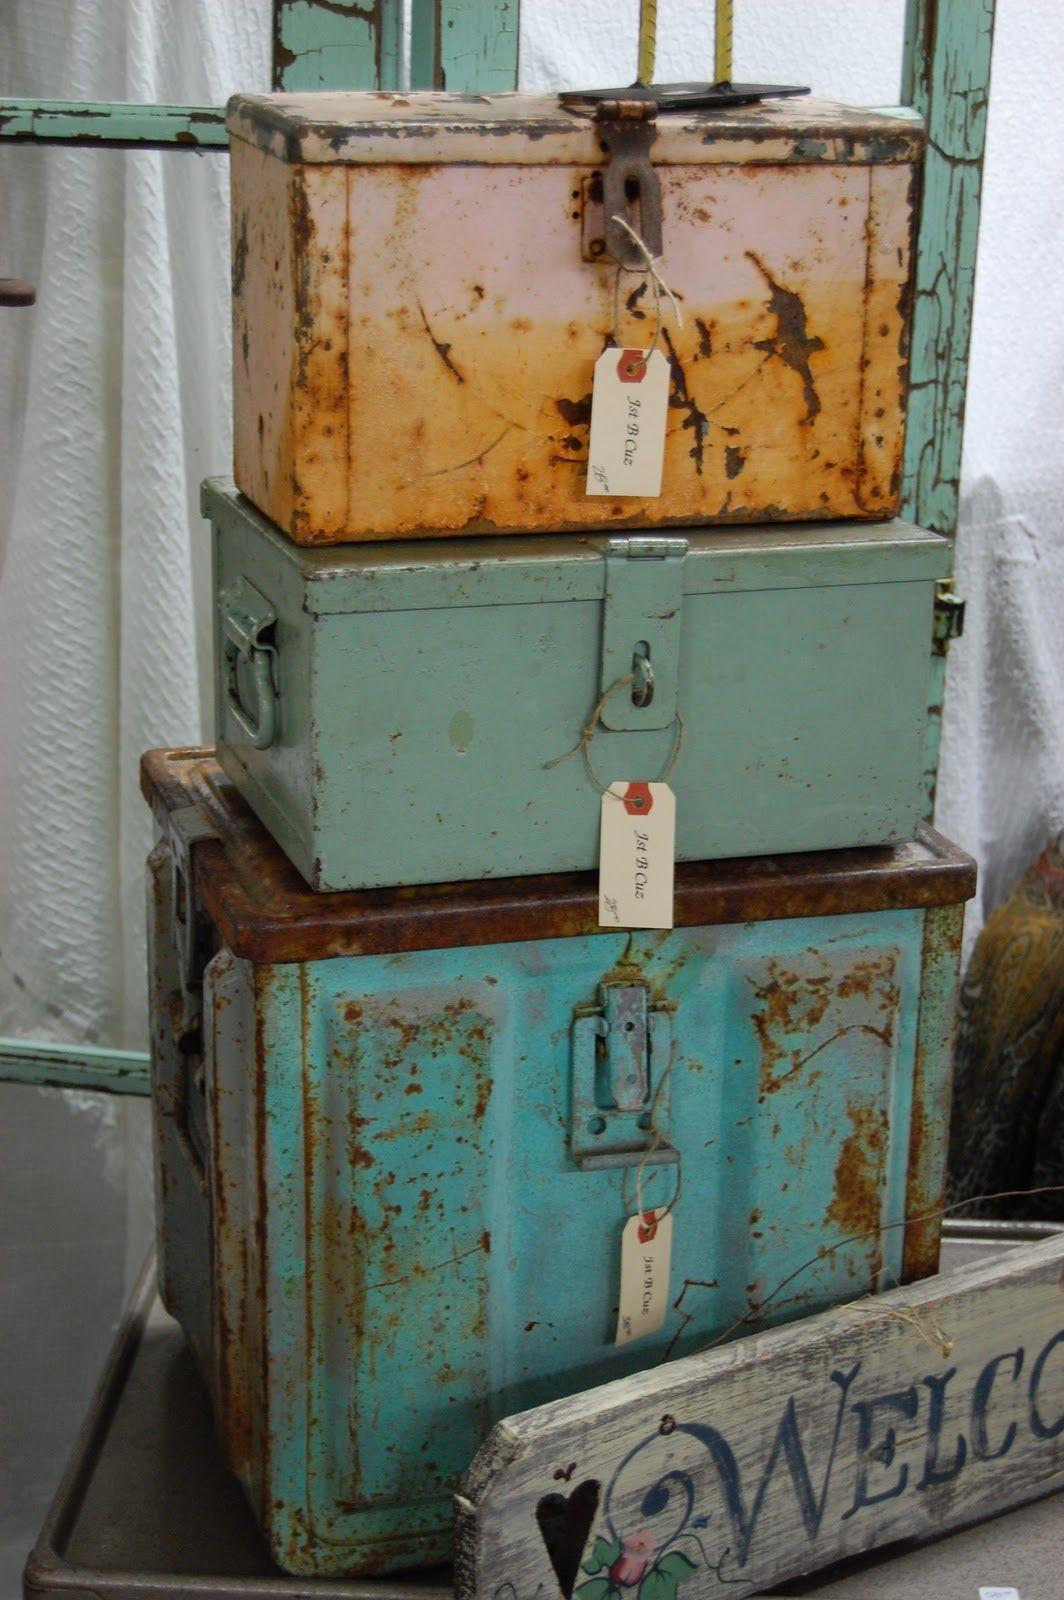 Maison Decor Tin Ceilings: Maison Douce: {Loving Me Some} Ruffles & Rust...